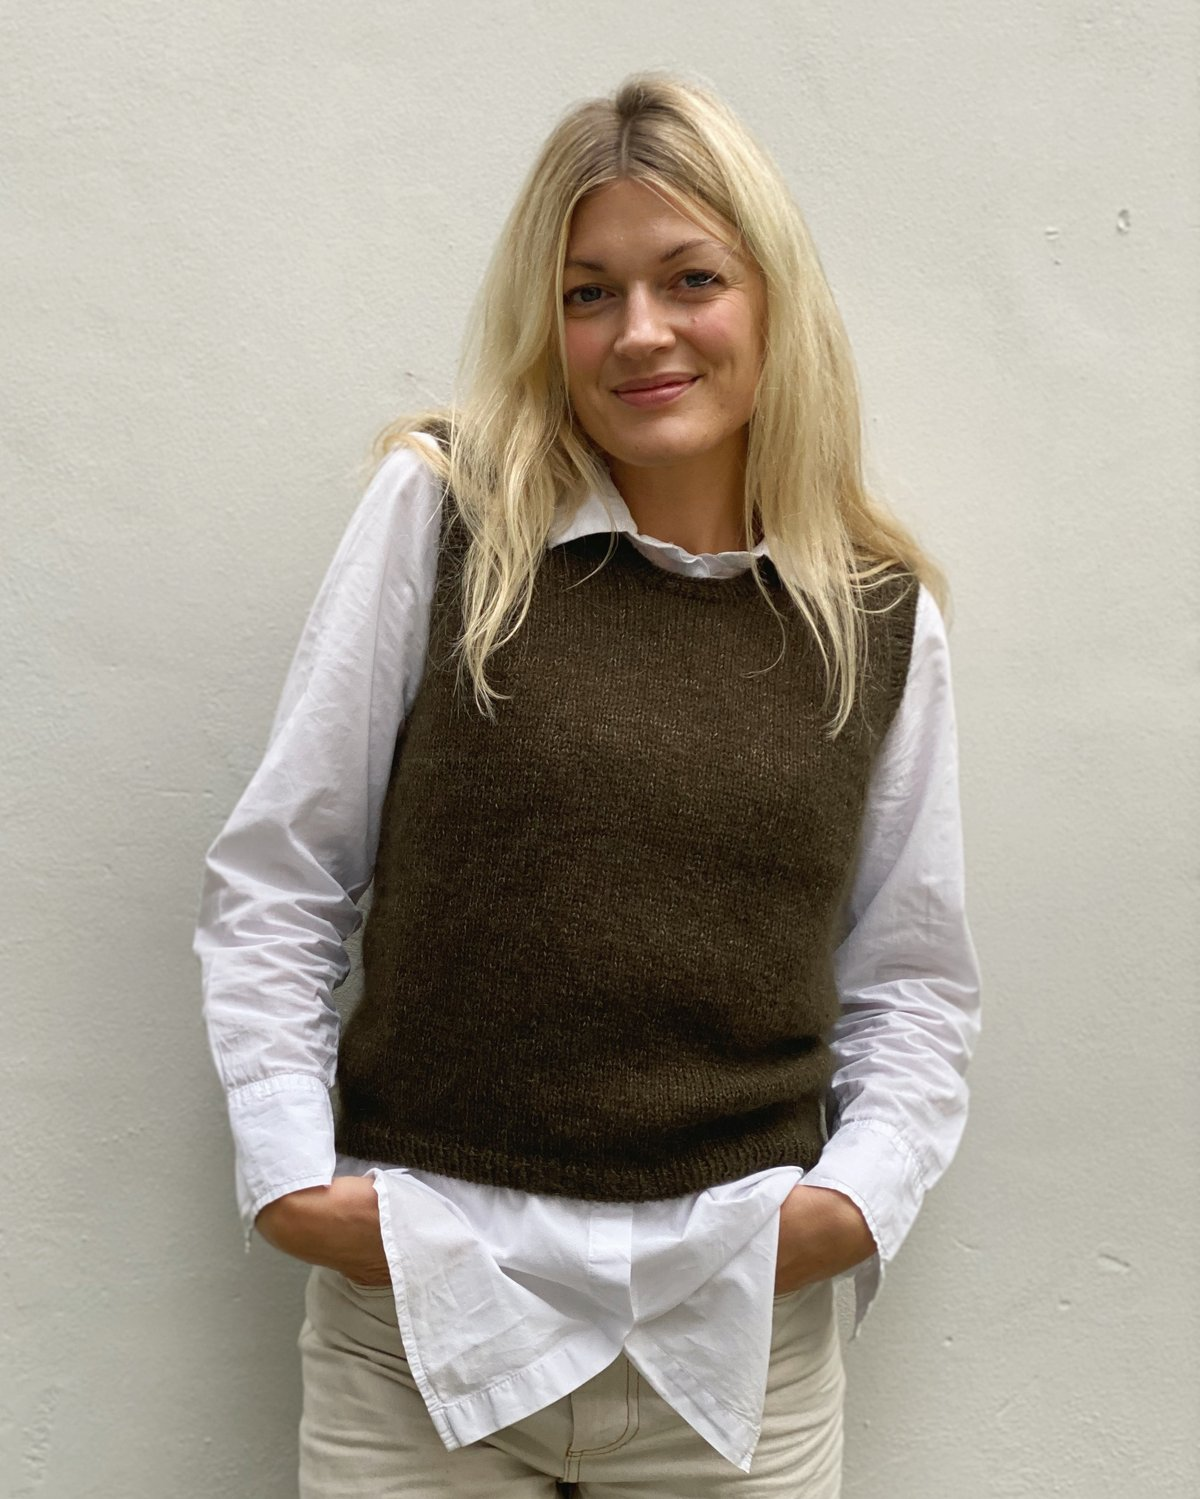 Stockholm Slipover by PetiteKnit pattern English